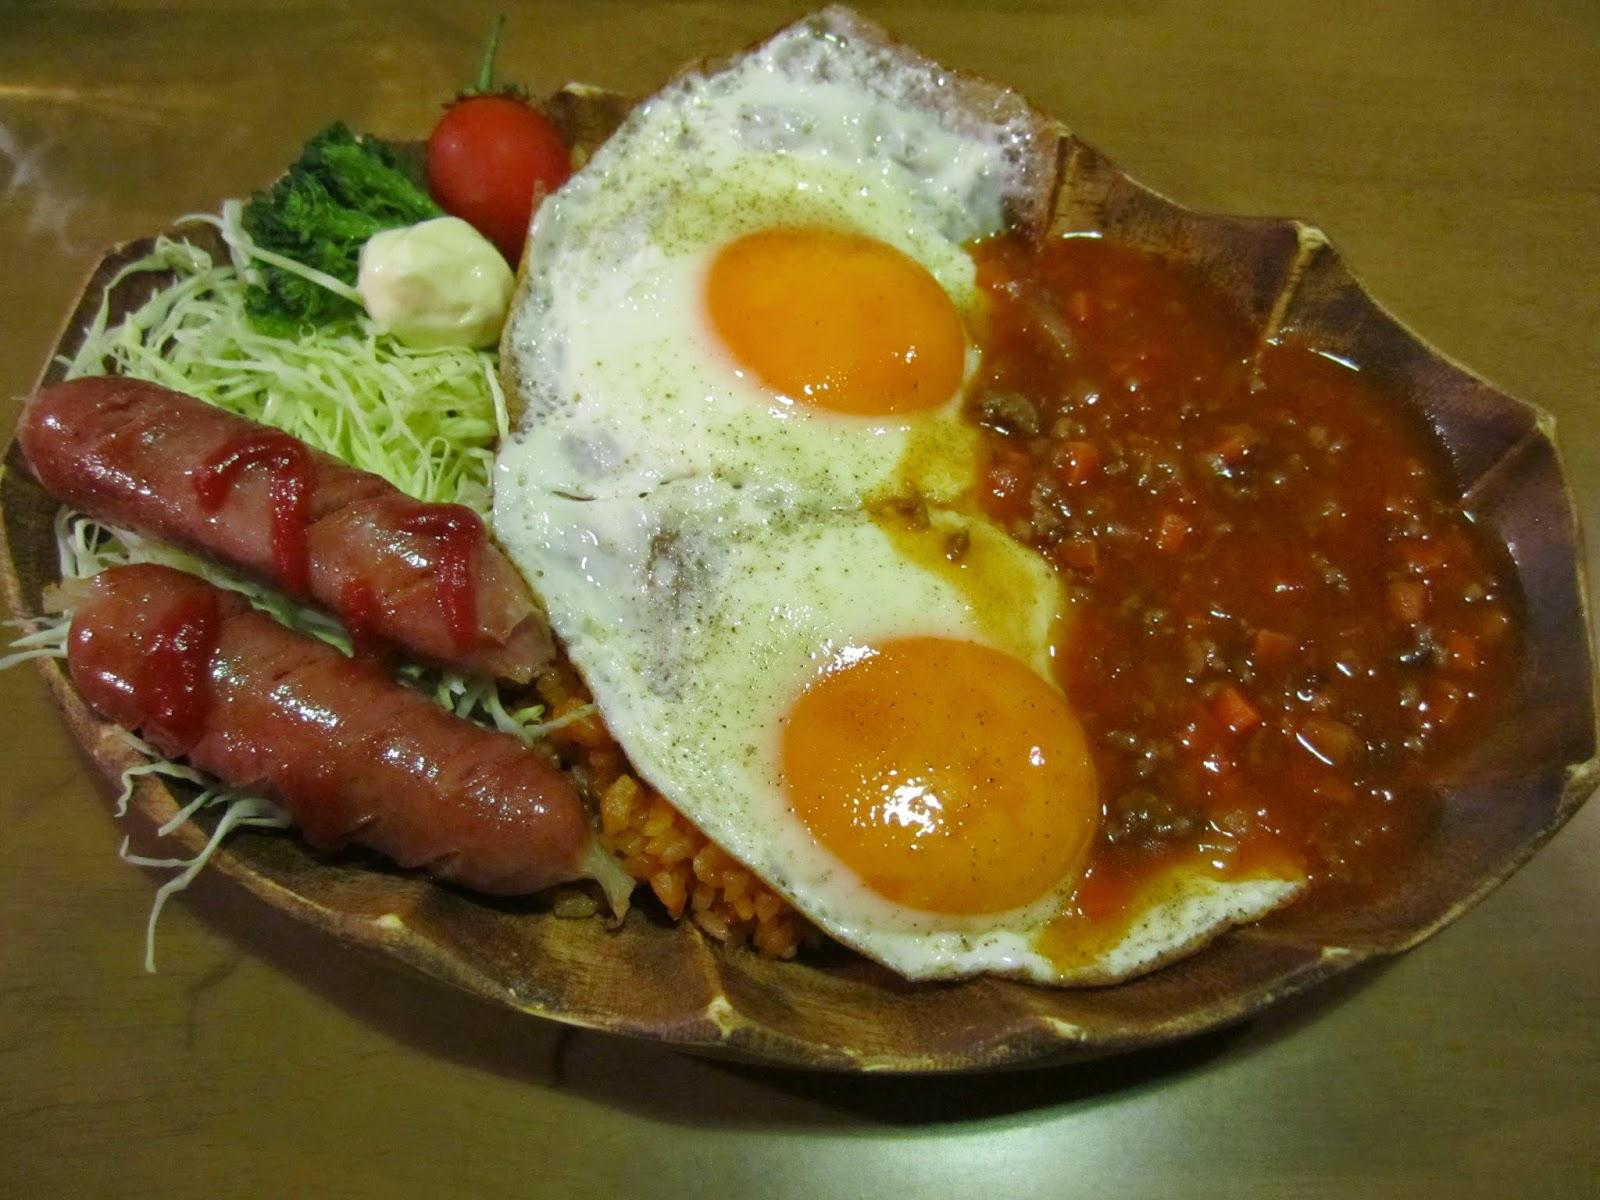 Omurice Towada Bunny Rabbit Cafe Usa Cafe Lovelies オムライス 十和田うさぎカフェ うさカフェラヴリーズ